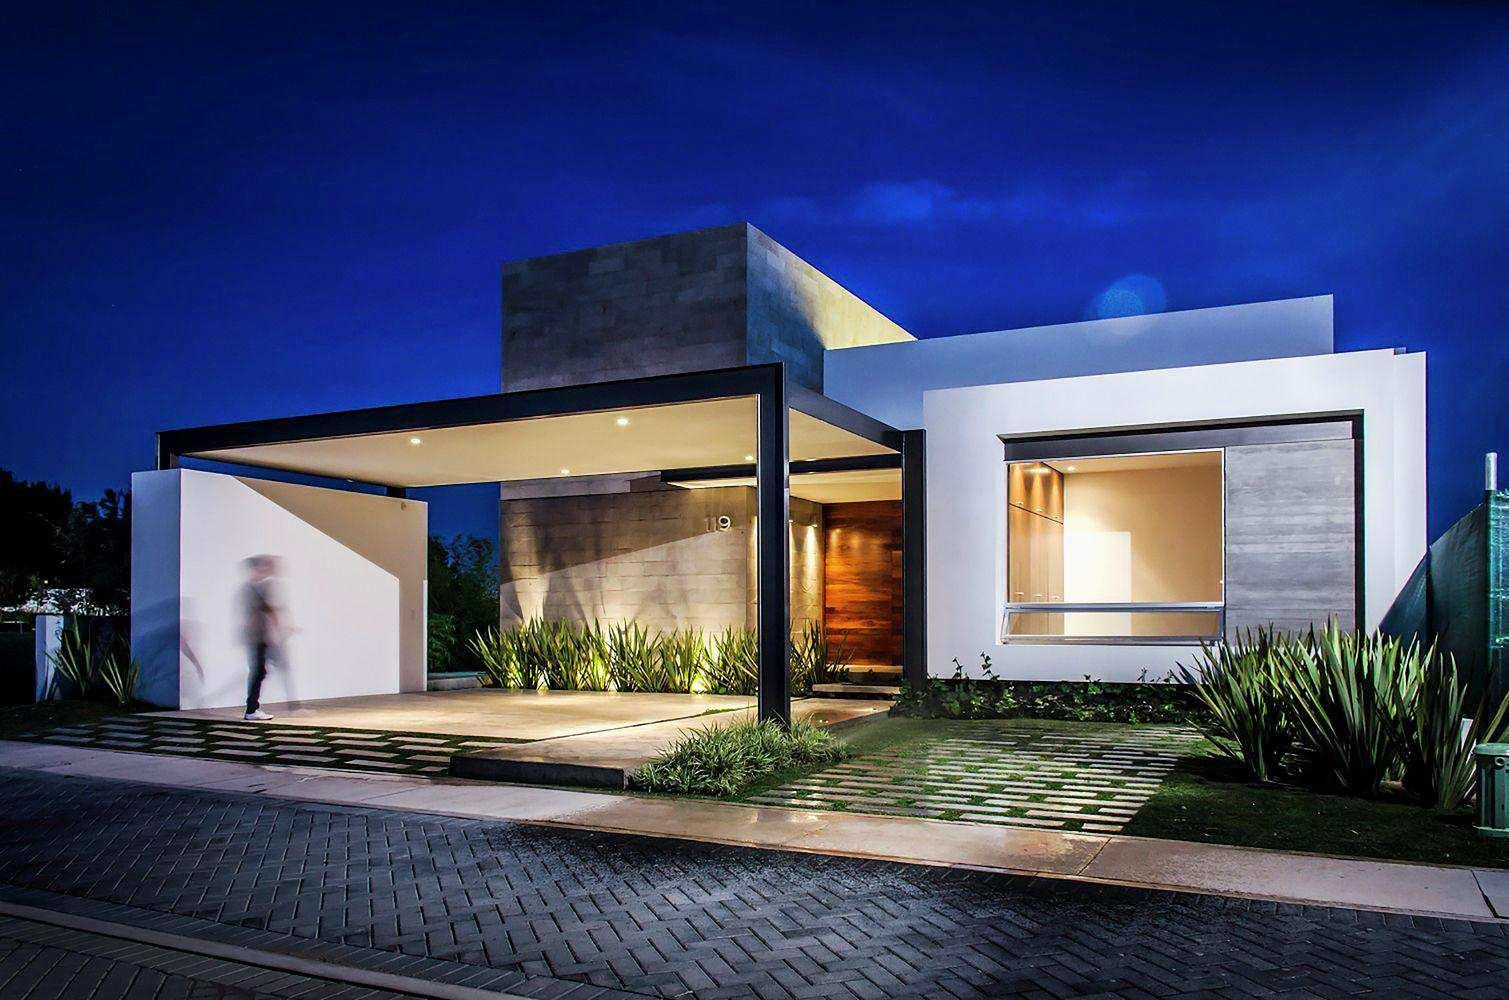 fachada-casa-terrea-muito-elegante-t02-adi-arquitectura-y-disec2b1o-interior-of-fachada-casa-terrea